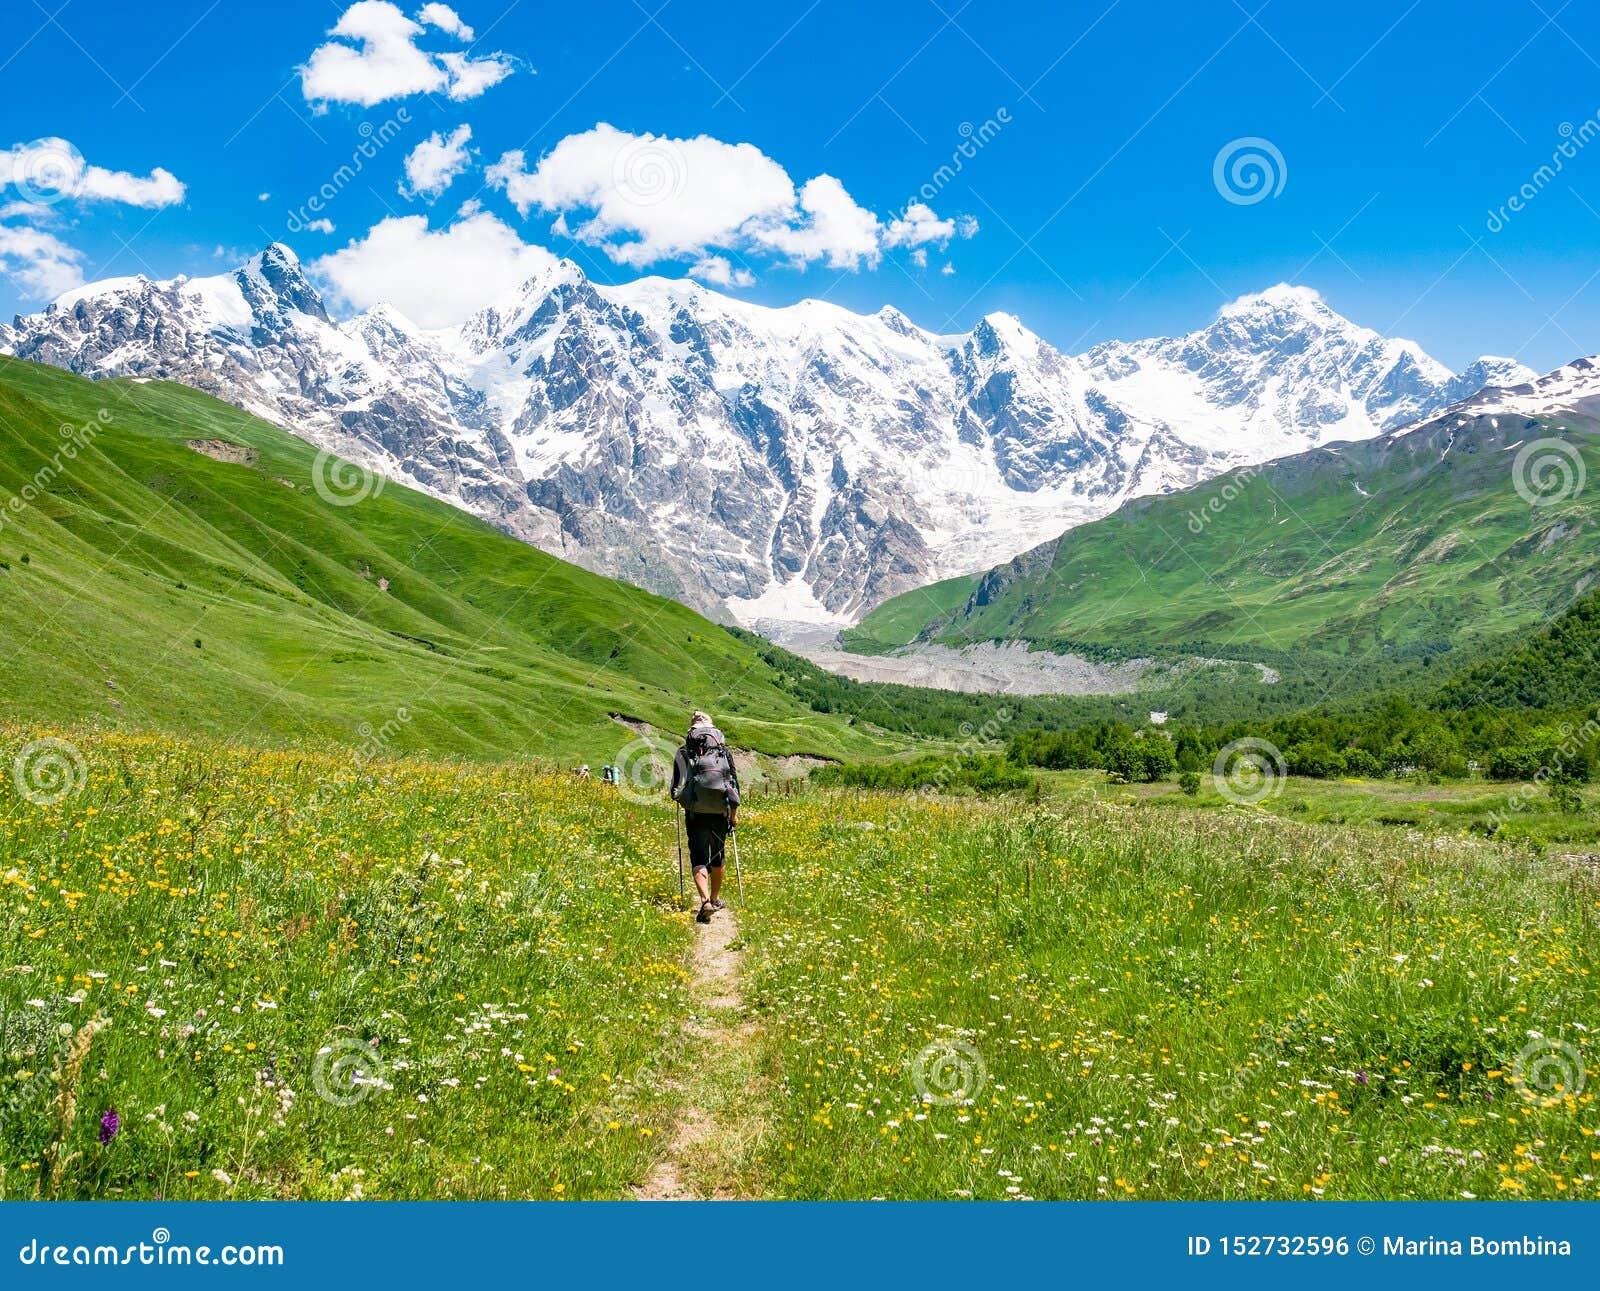 Turista con una mochila en las montañas del Cáucaso Regi?n de Svaneti, Georgia